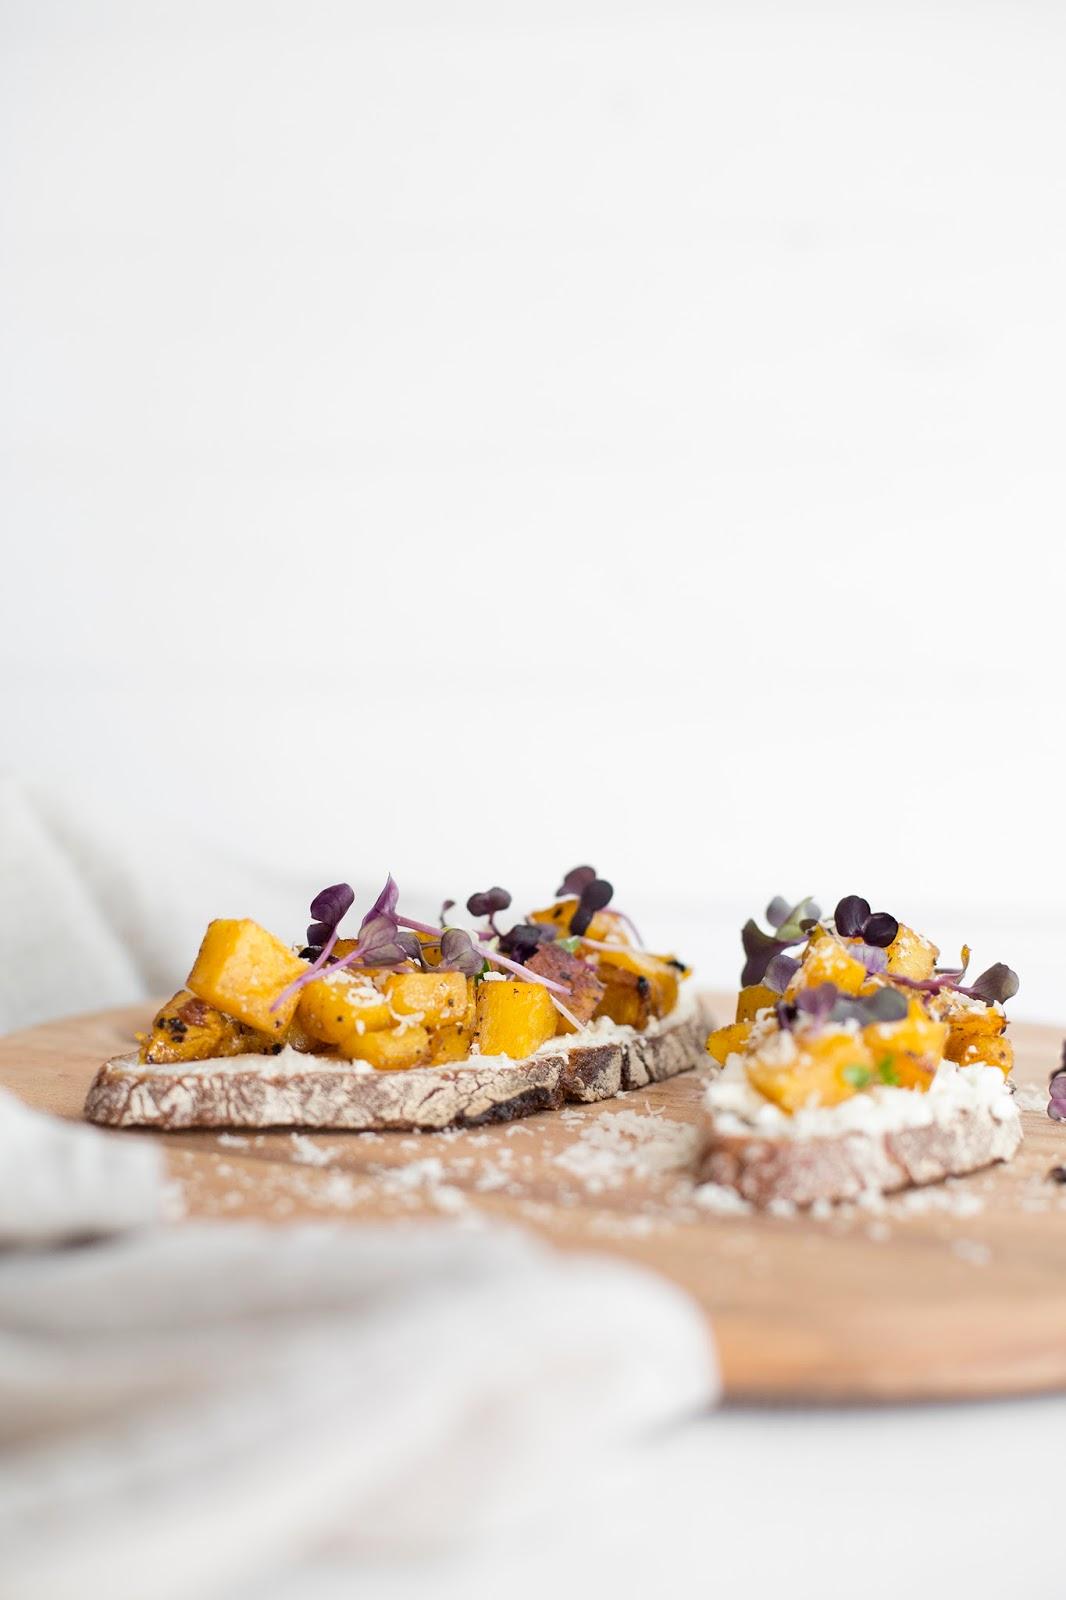 Salty Bread mit Butternut-Kürbis